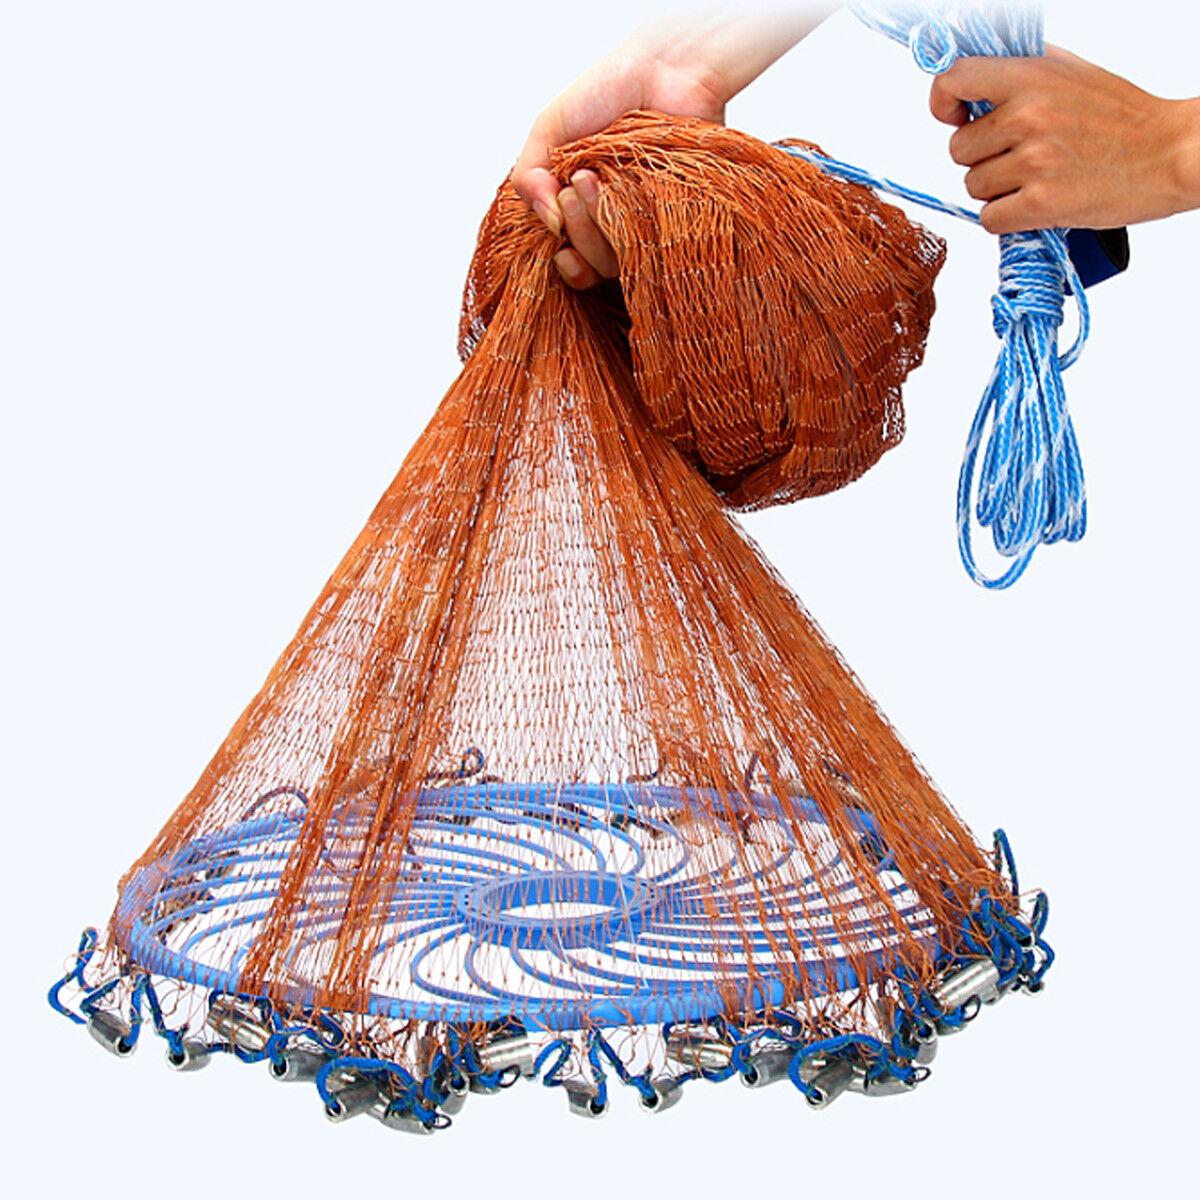 3-4.8m Netting Twine+Steel Hand Throw Cast Net  American Style Brown Bait Fishing  amazing colorways